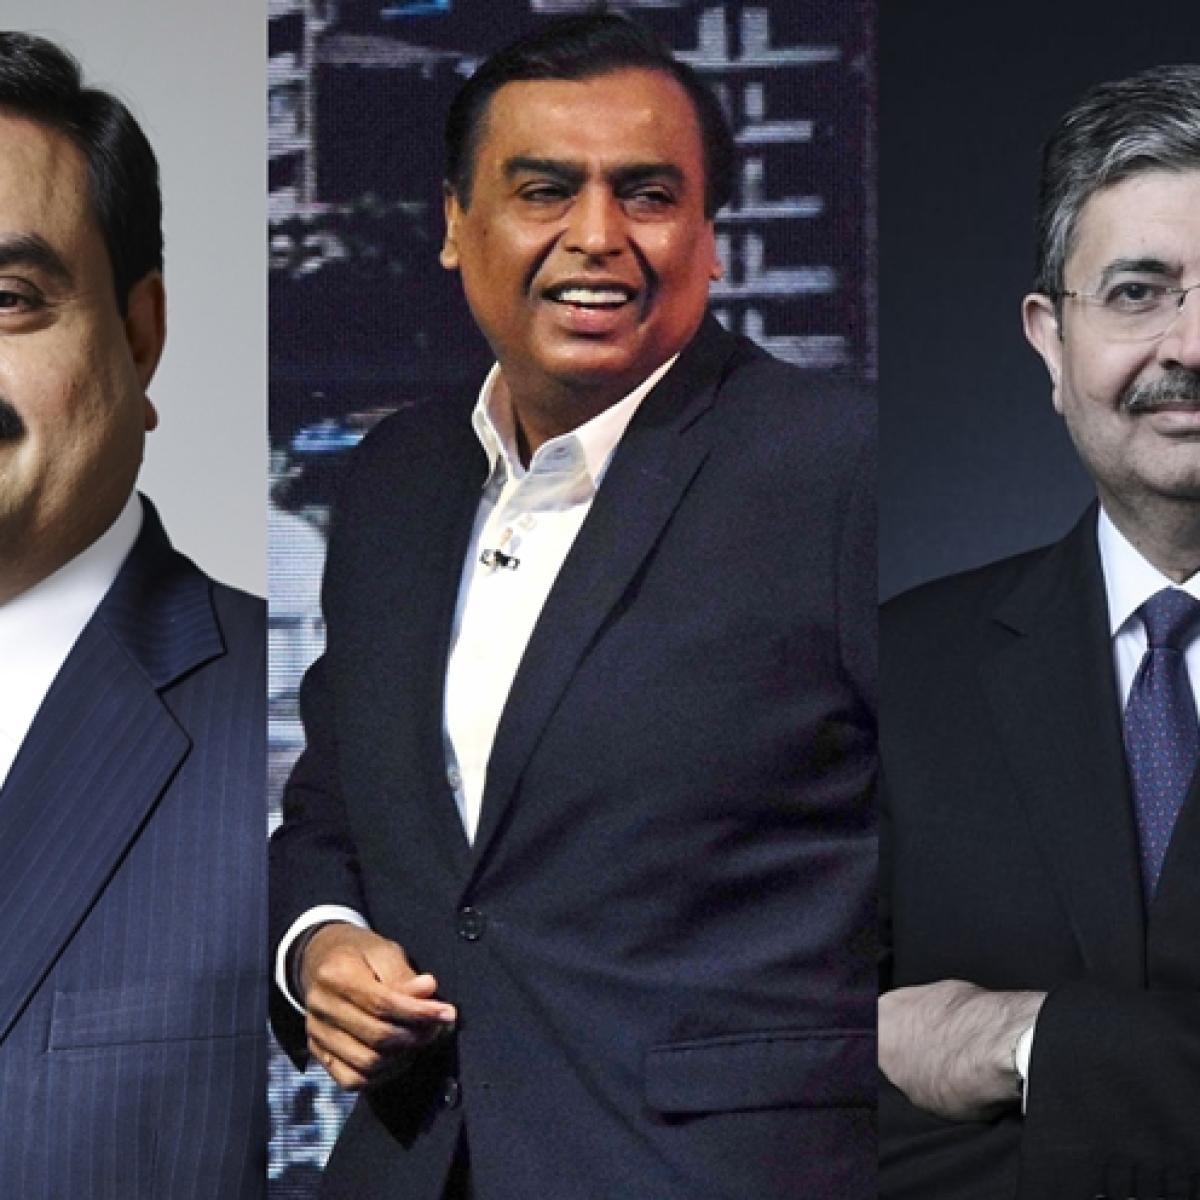 Hurun Global Rich List 2020: Ambani, Adani, Kotak in top 100 billionaires